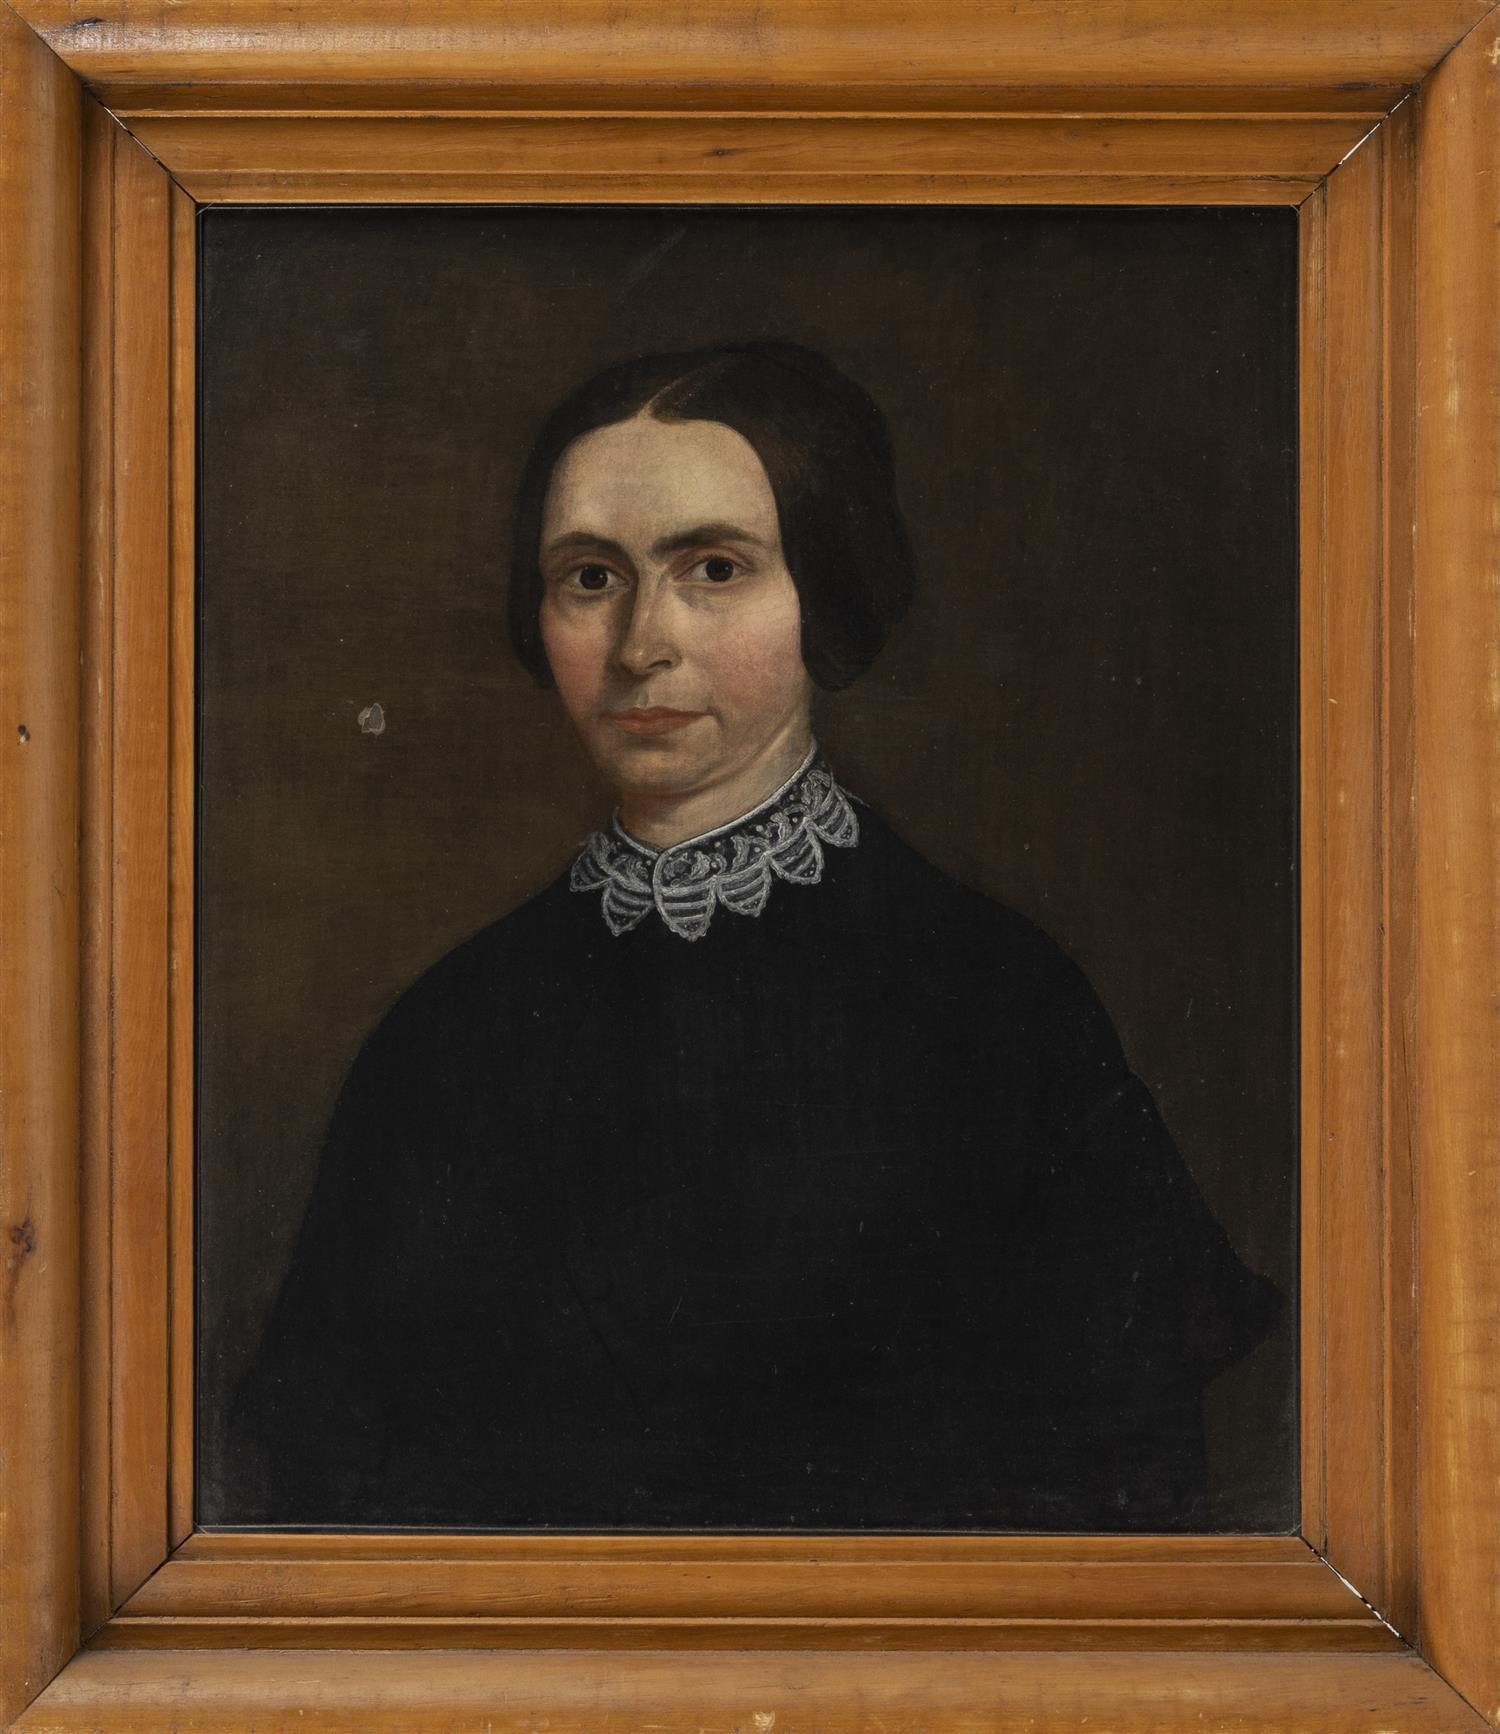 "AMERICAN SCHOOL, 19th Century, Portrait of a woman., Oil on canvas, 24"" x 20"". Framed 30.5"" x 26""."